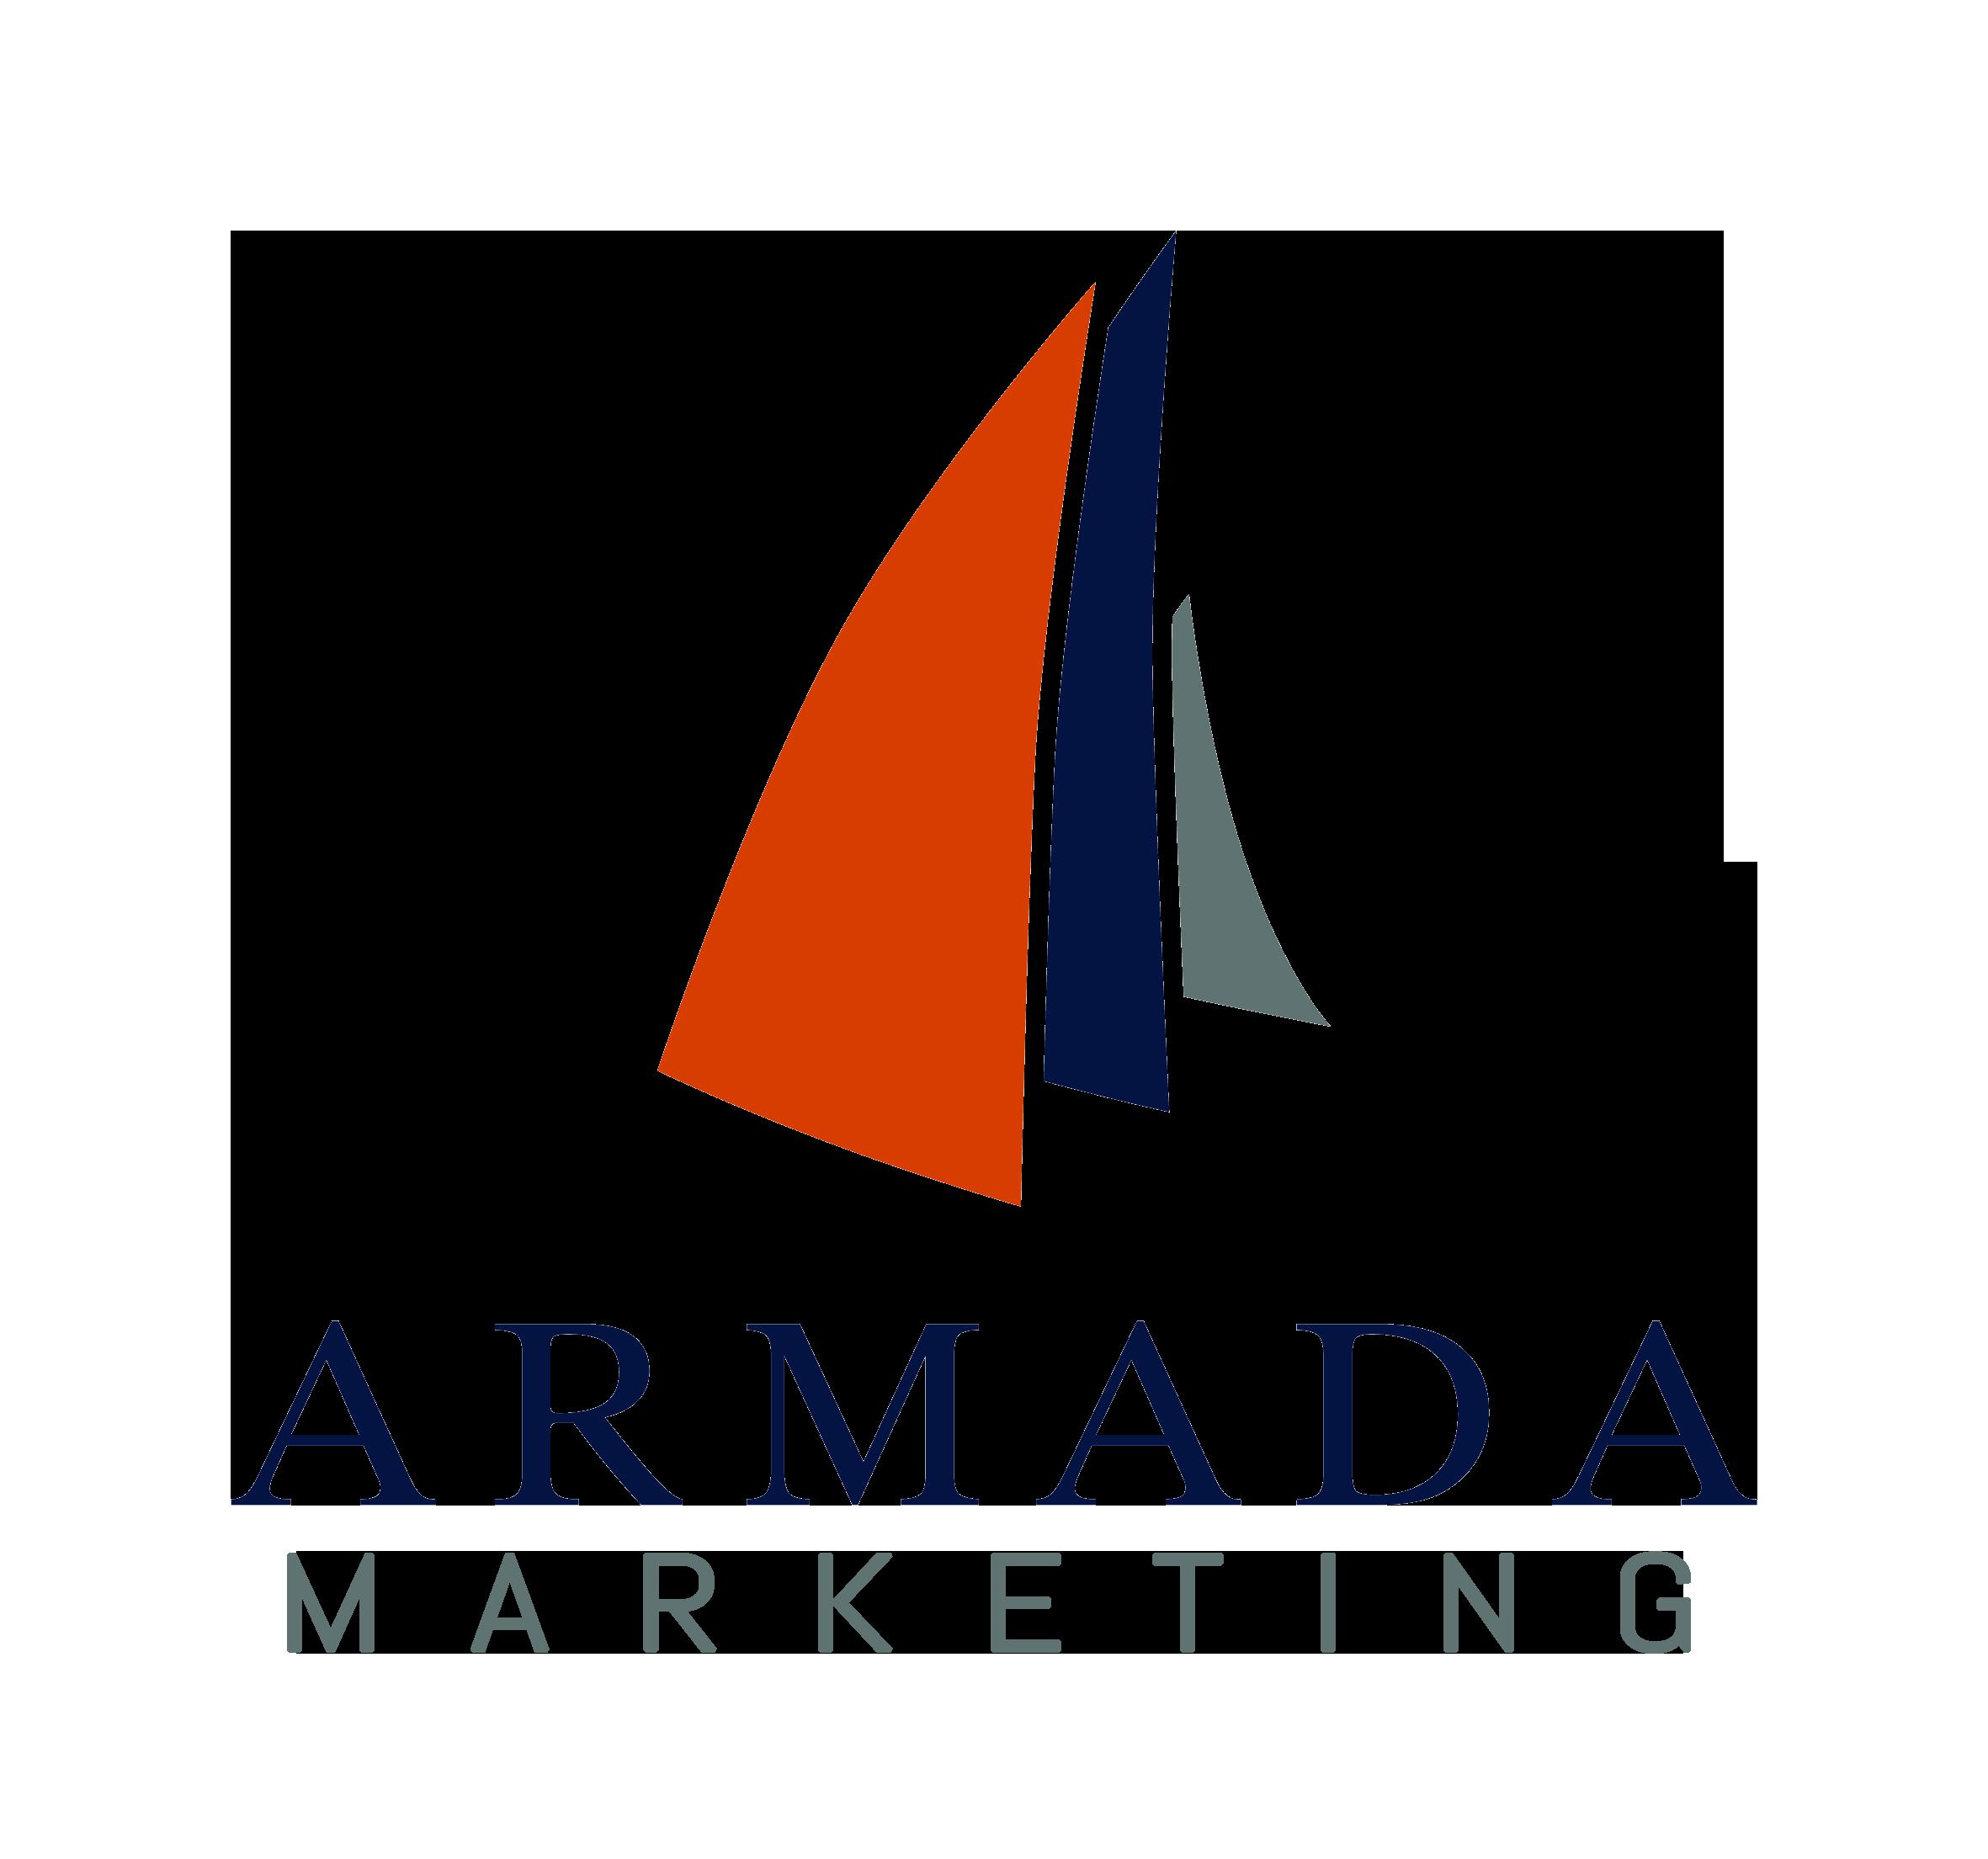 armada-marketing-logo-v3